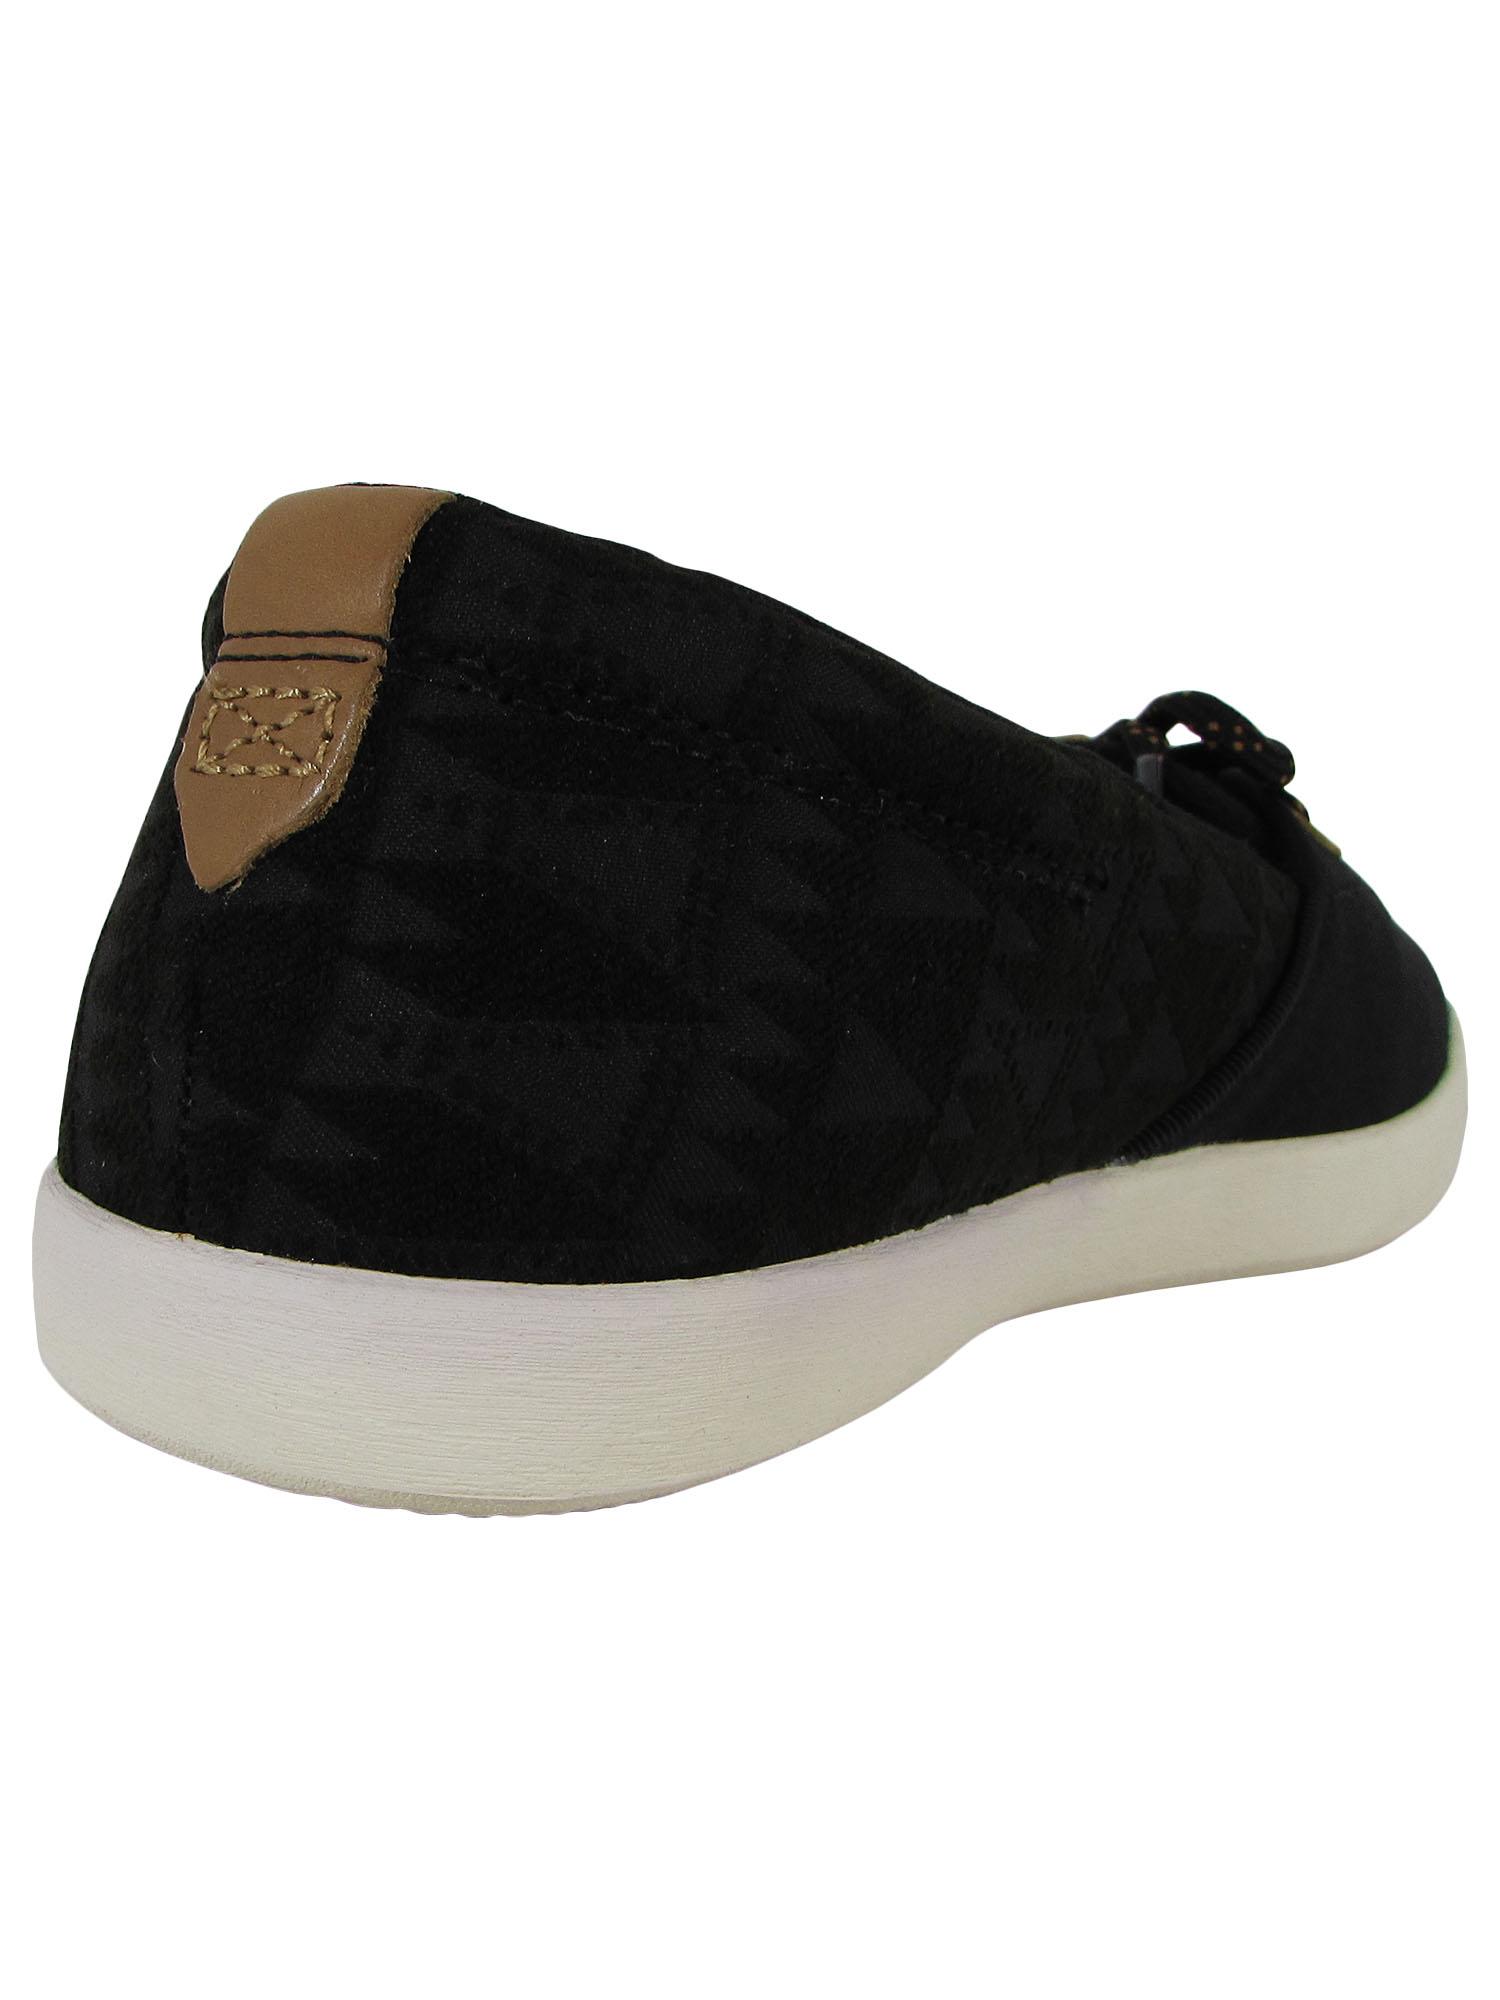 Teva-Womens-Willow-Slip-On-Sneaker-Shoes thumbnail 4